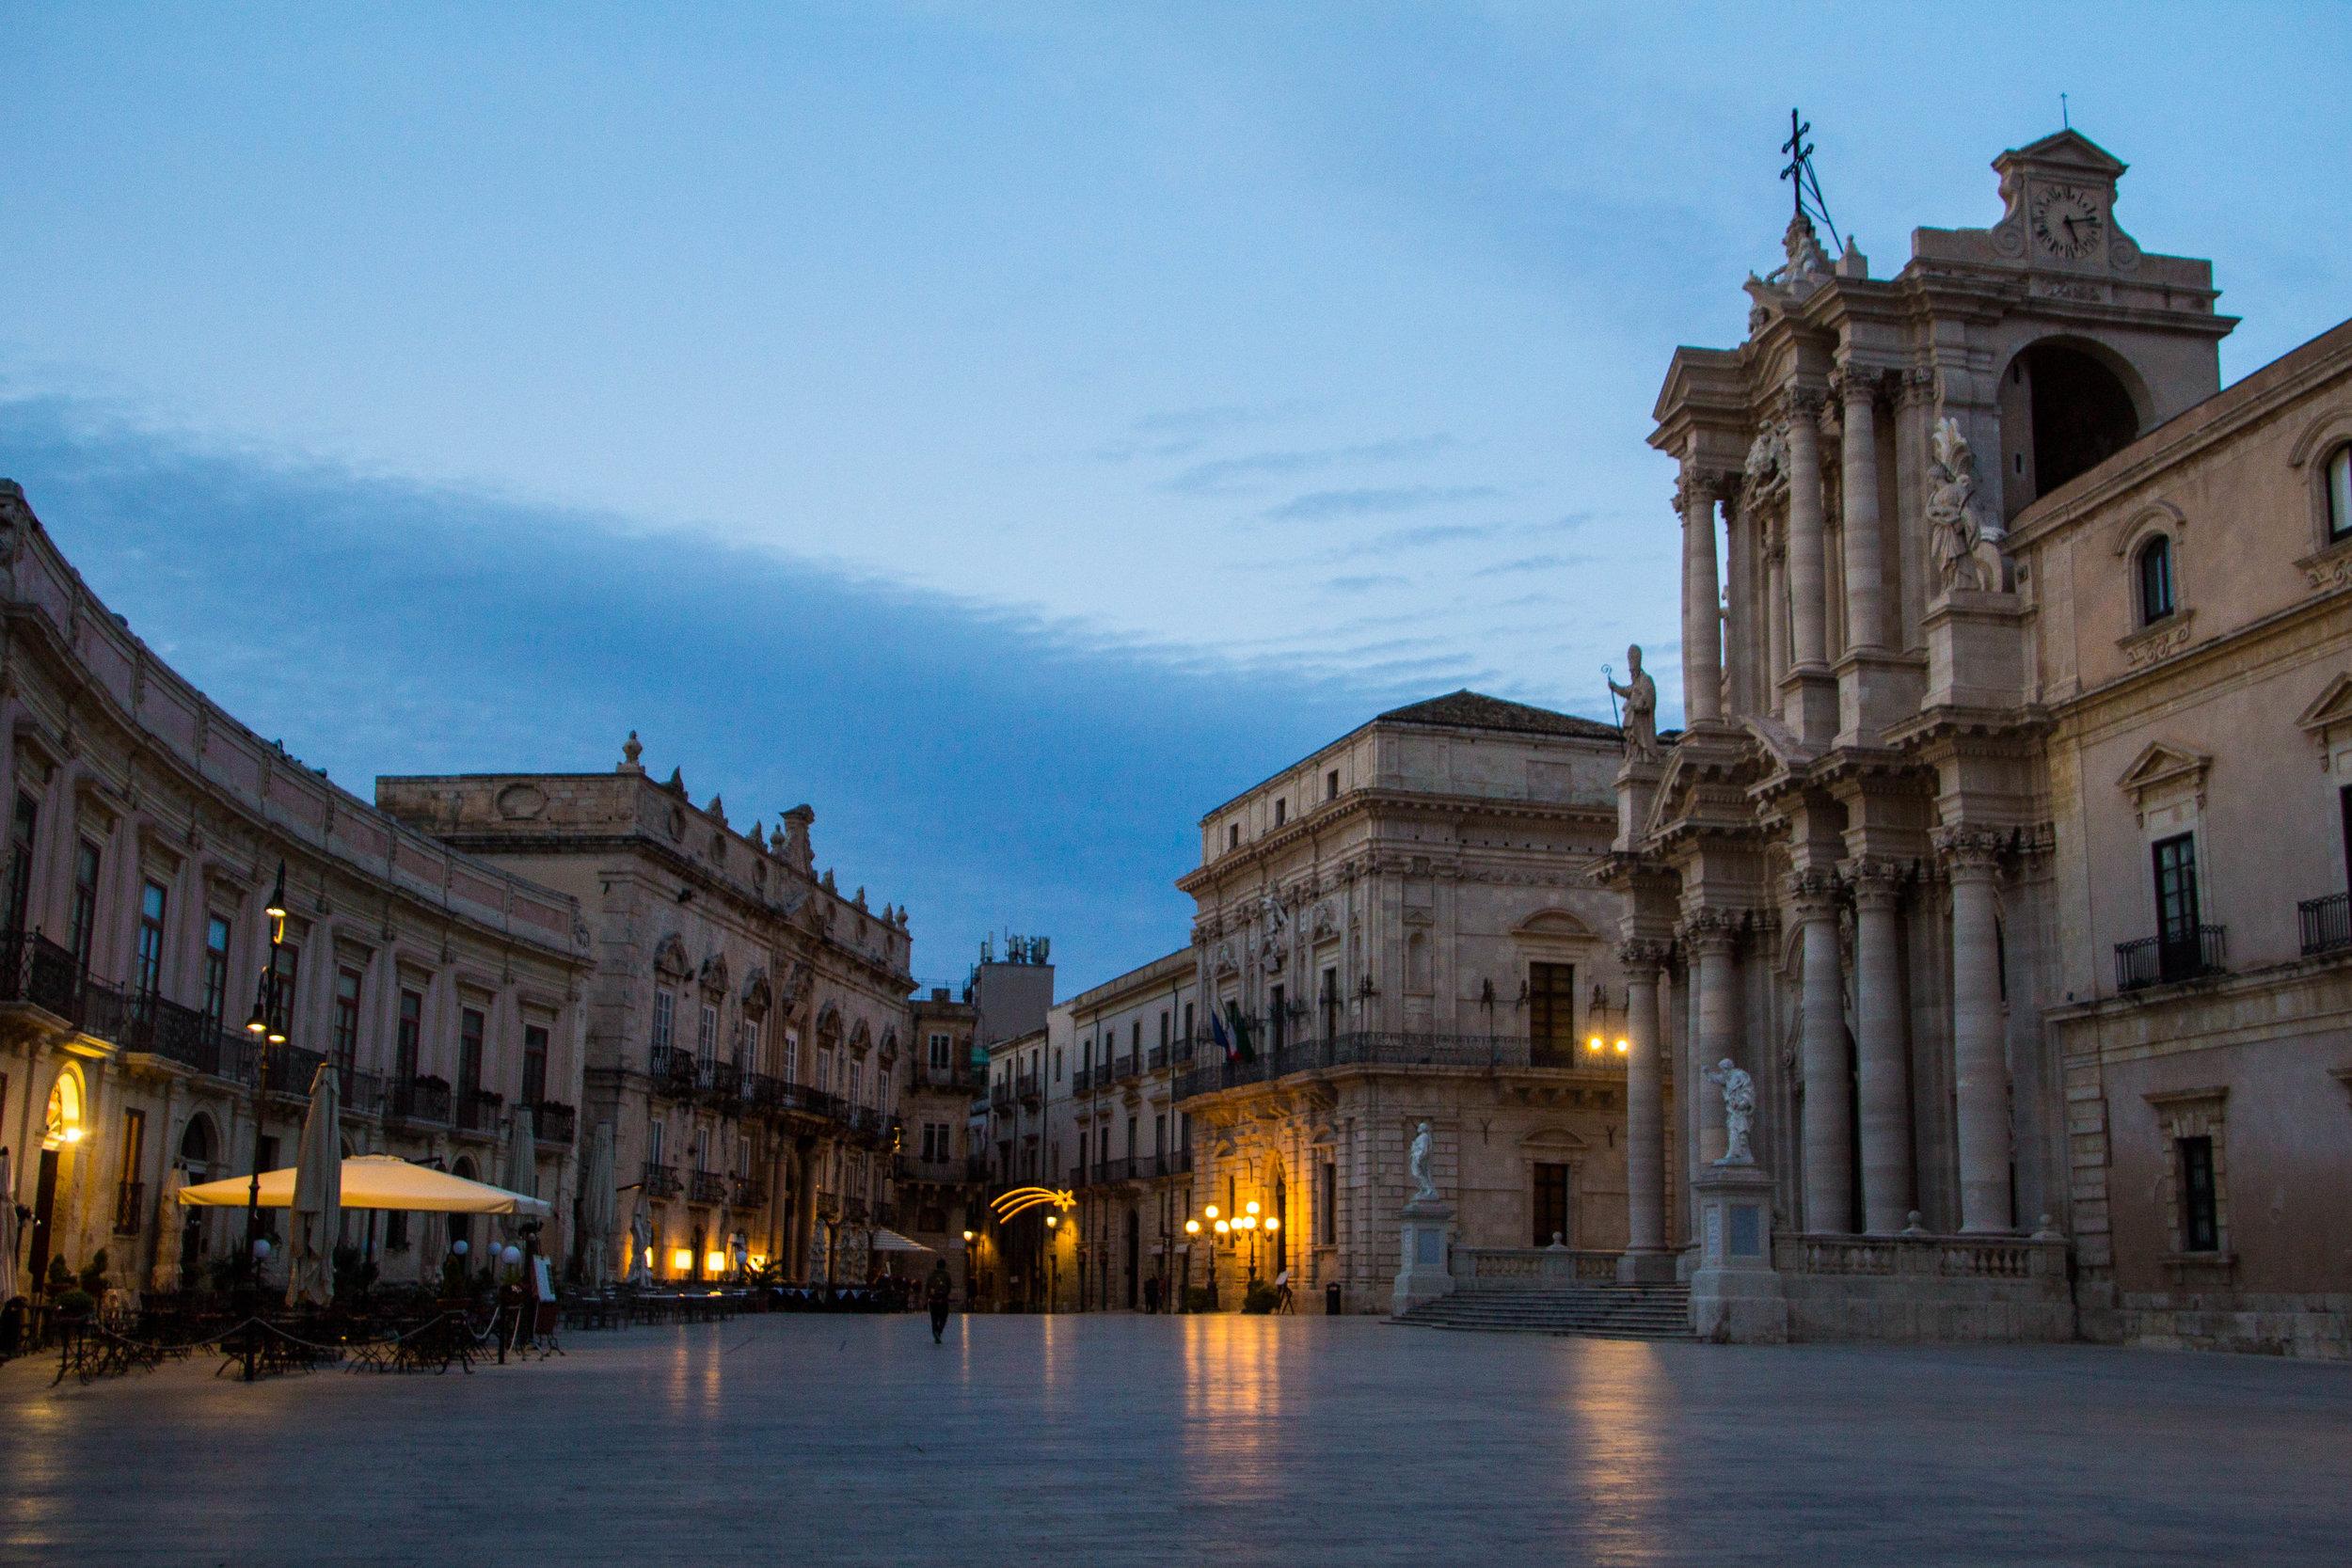 piazza-duomo-sunset-ortygia-syracuse-sicily-21.jpg